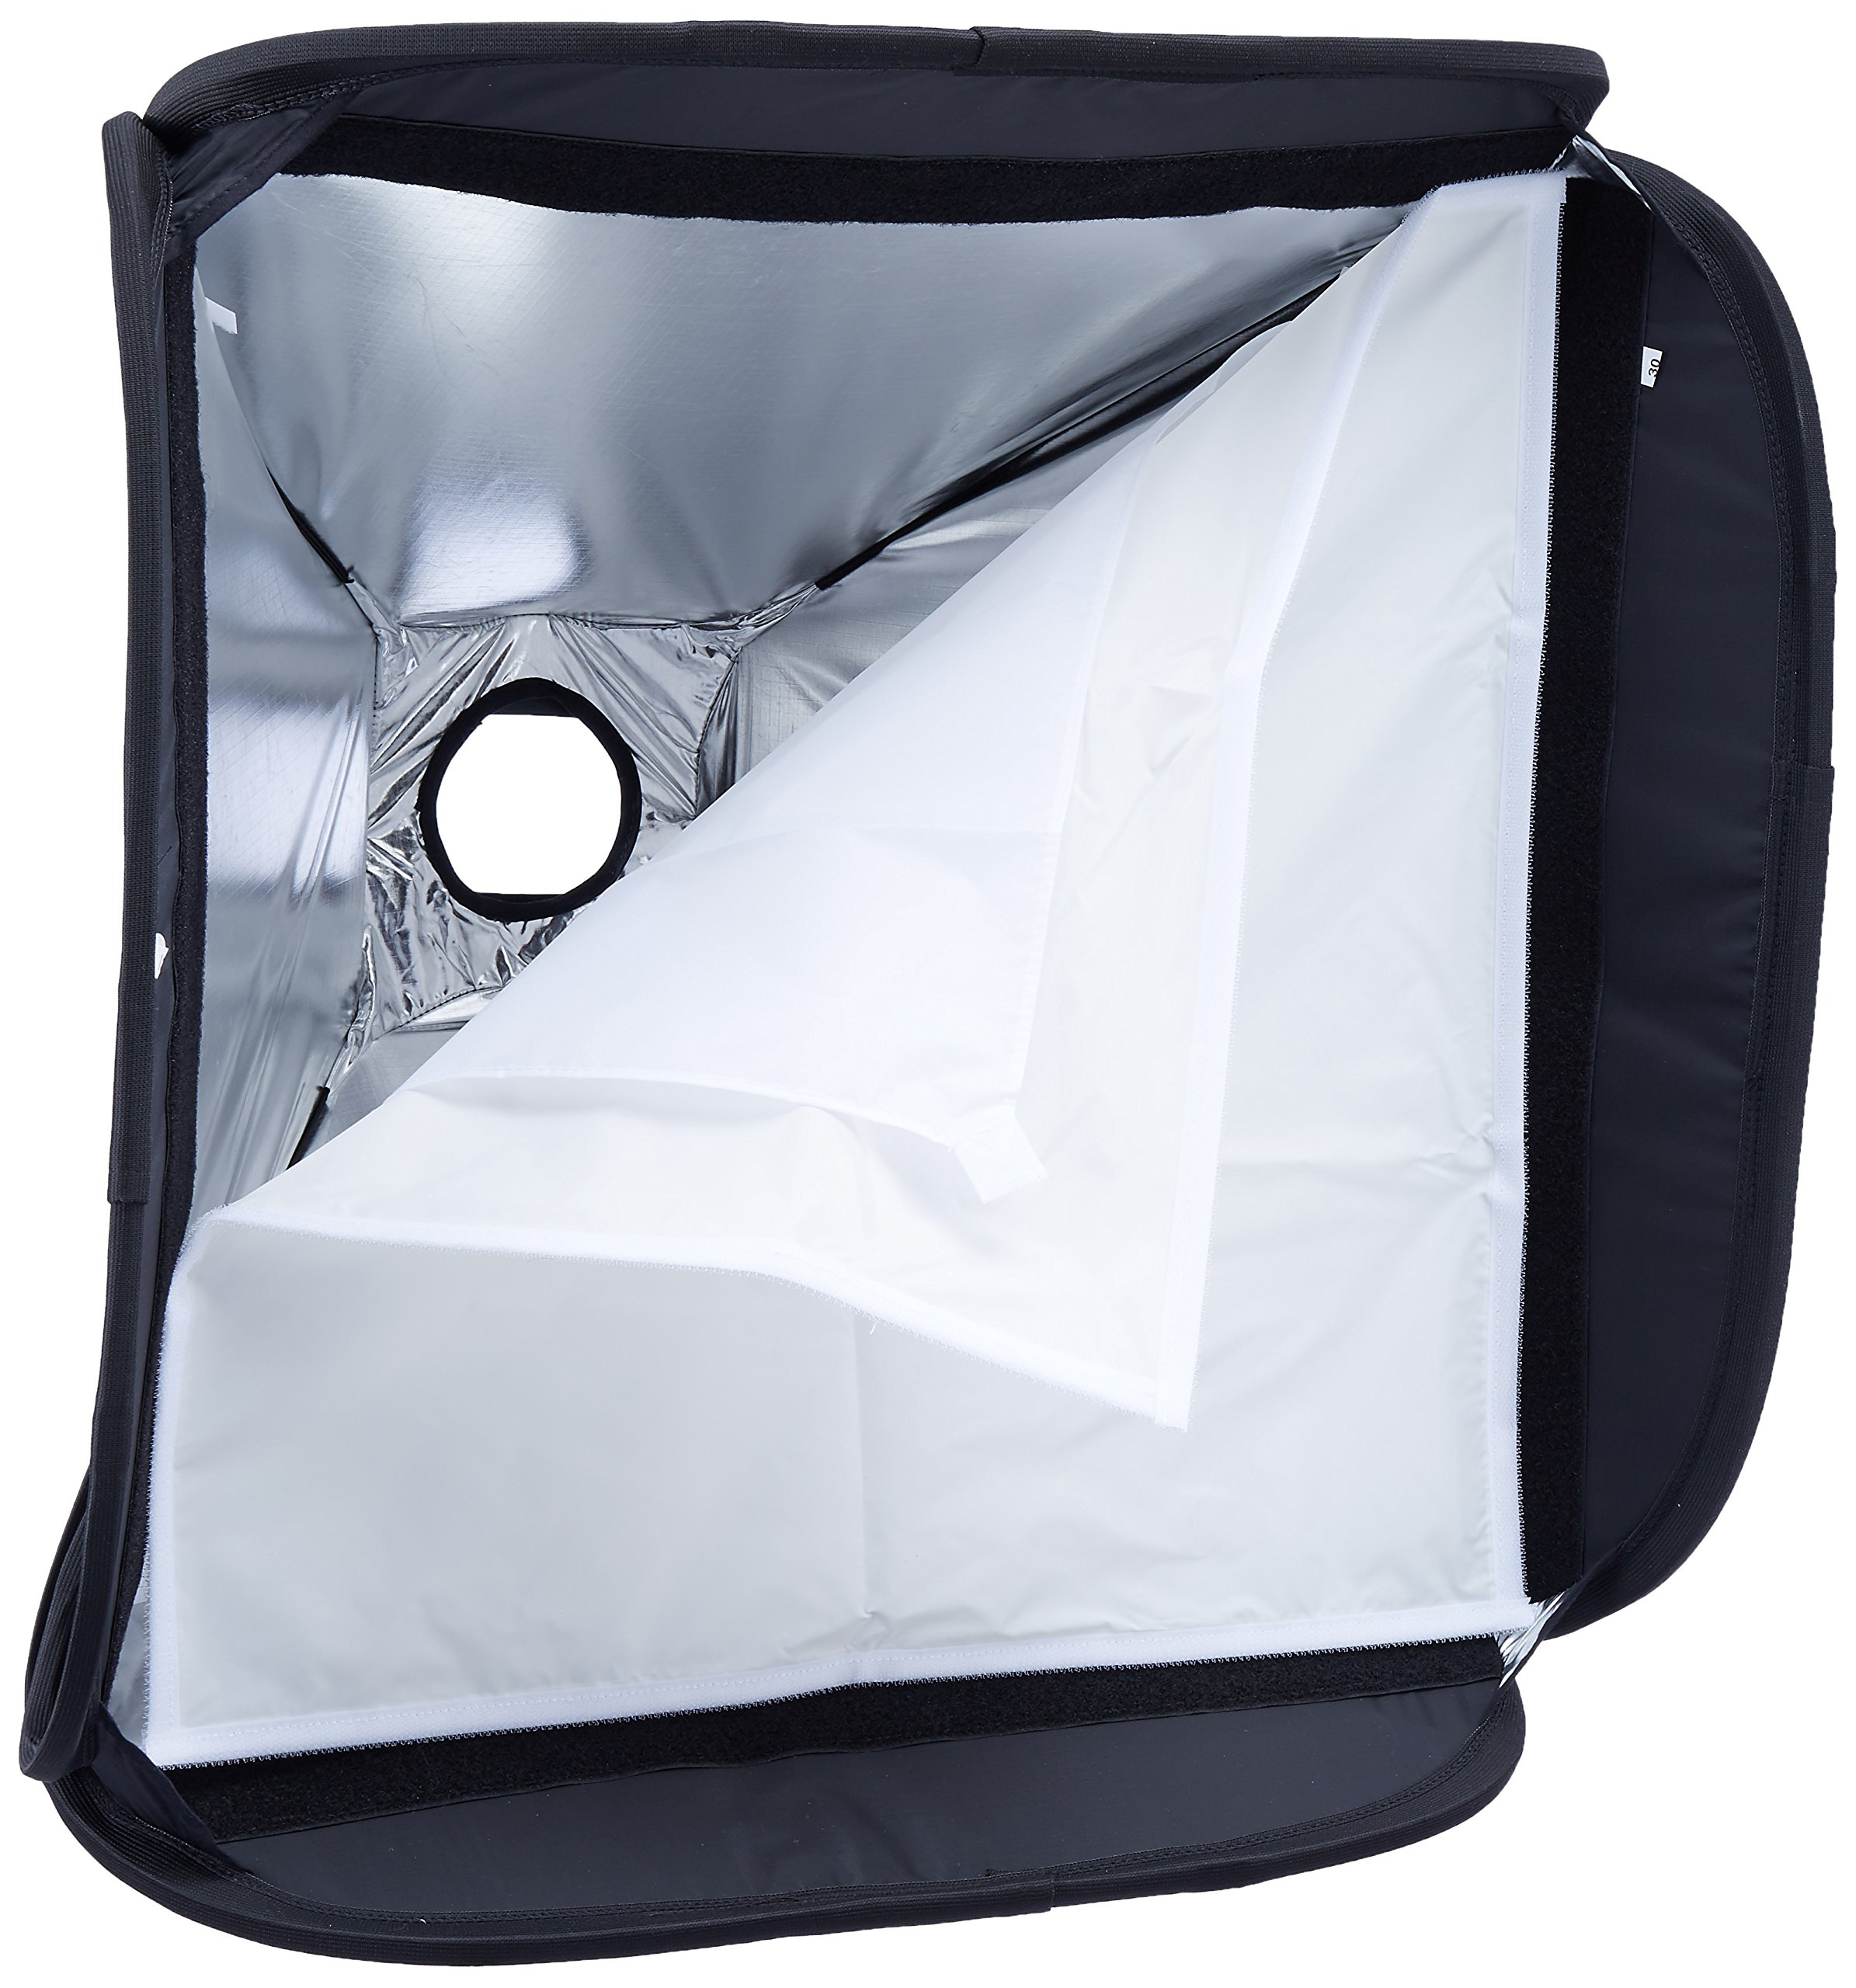 LastoLite LL LS2462 24x24 Inches Ezybox Hot Shoe Kit with Bracket (Black) by Lastolite